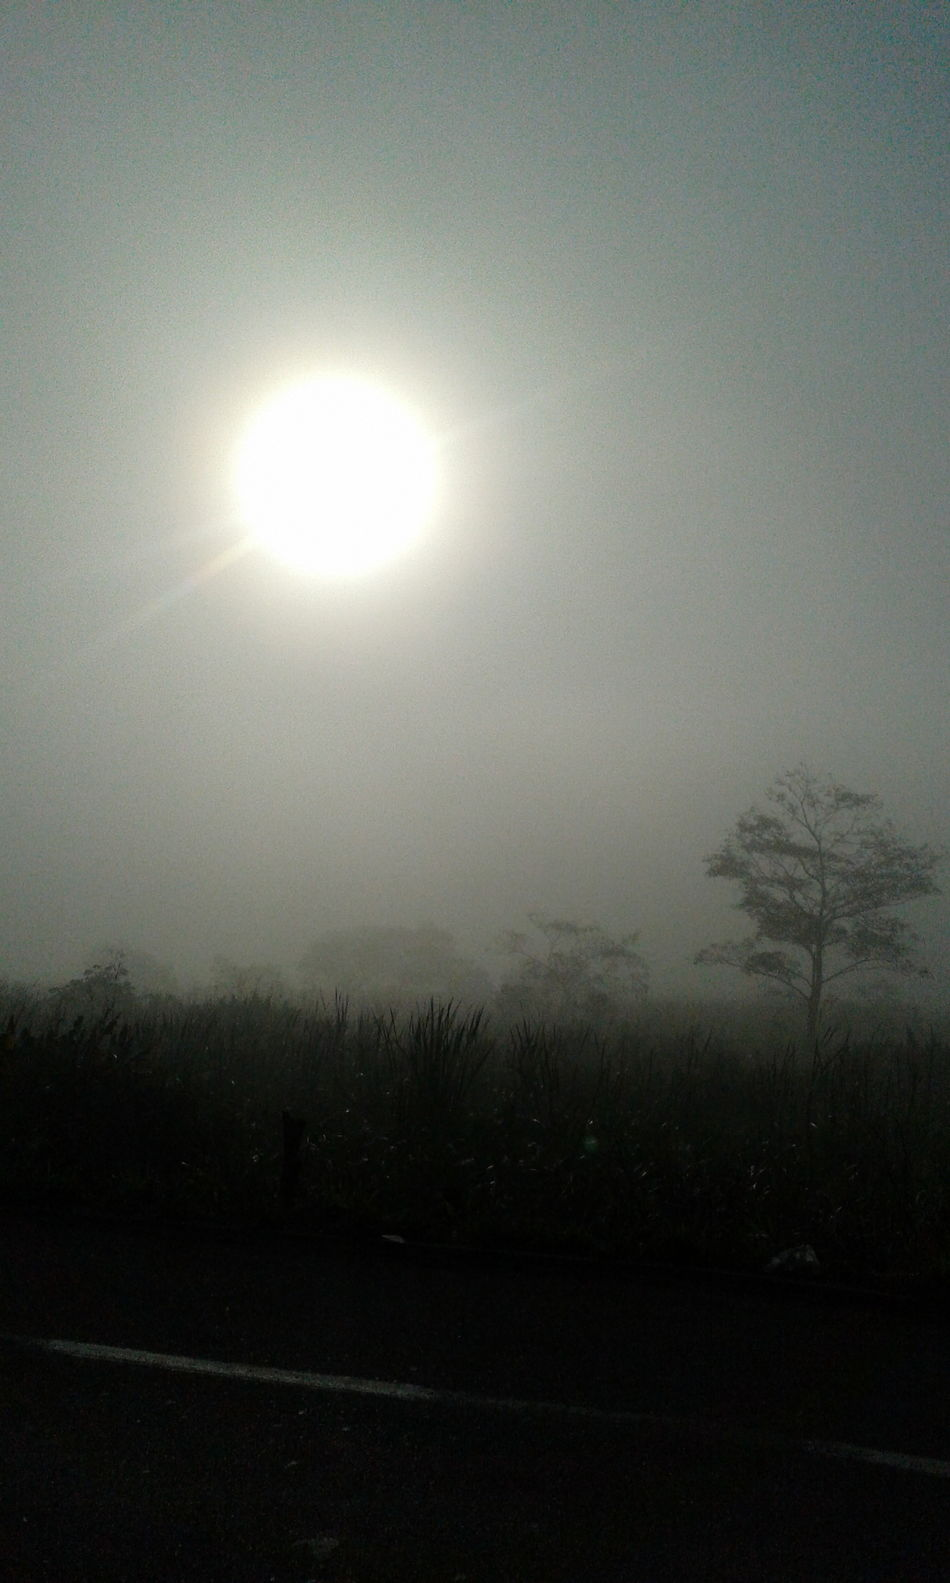 Nature Sky Rain Outdoors Silhouette Sun Tranquil Scene Scenics Beauty In Nature No People Moon Day Neblina